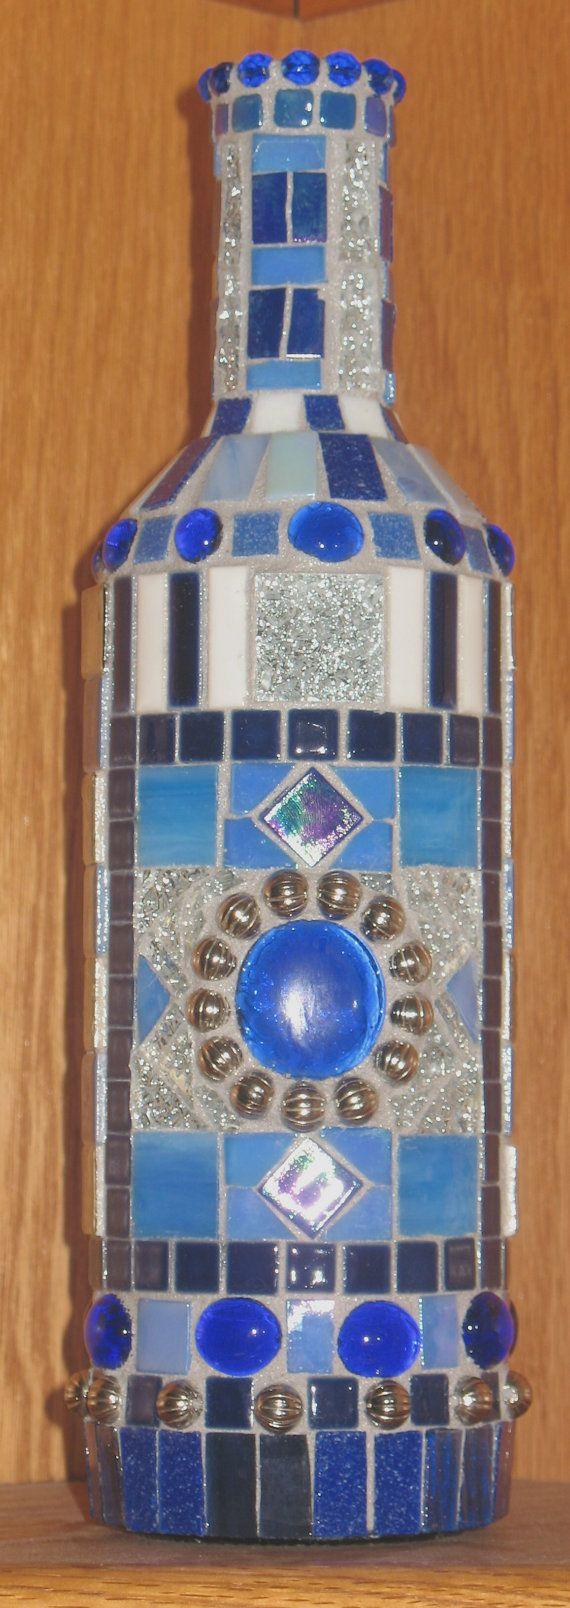 43 best mosaic paper images on pinterest | mosaic ideas, mosaic